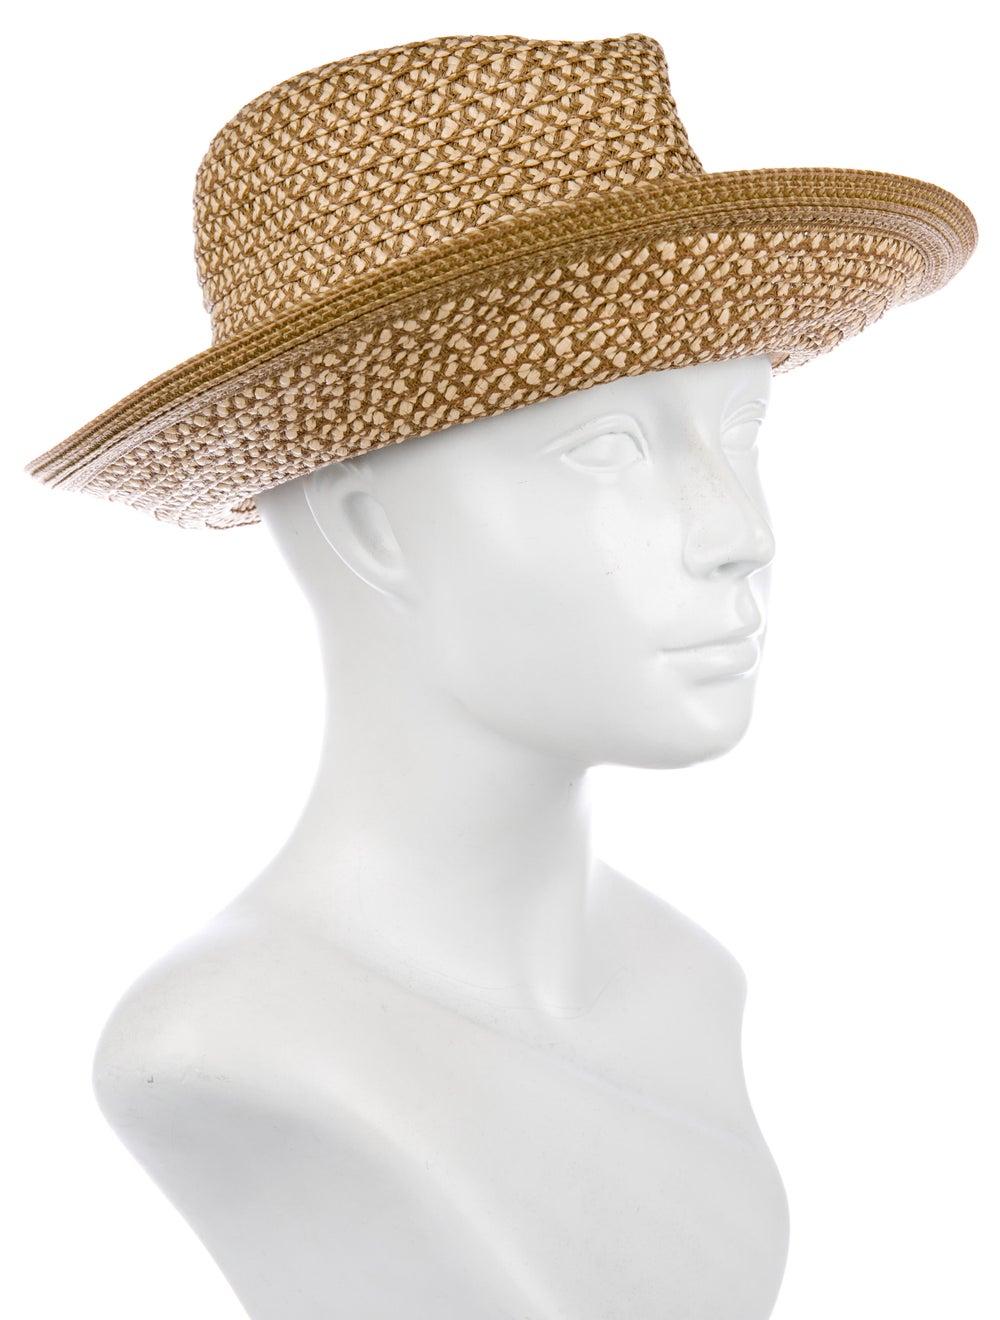 Eric Javits Woven Straw Hat Tan - image 3